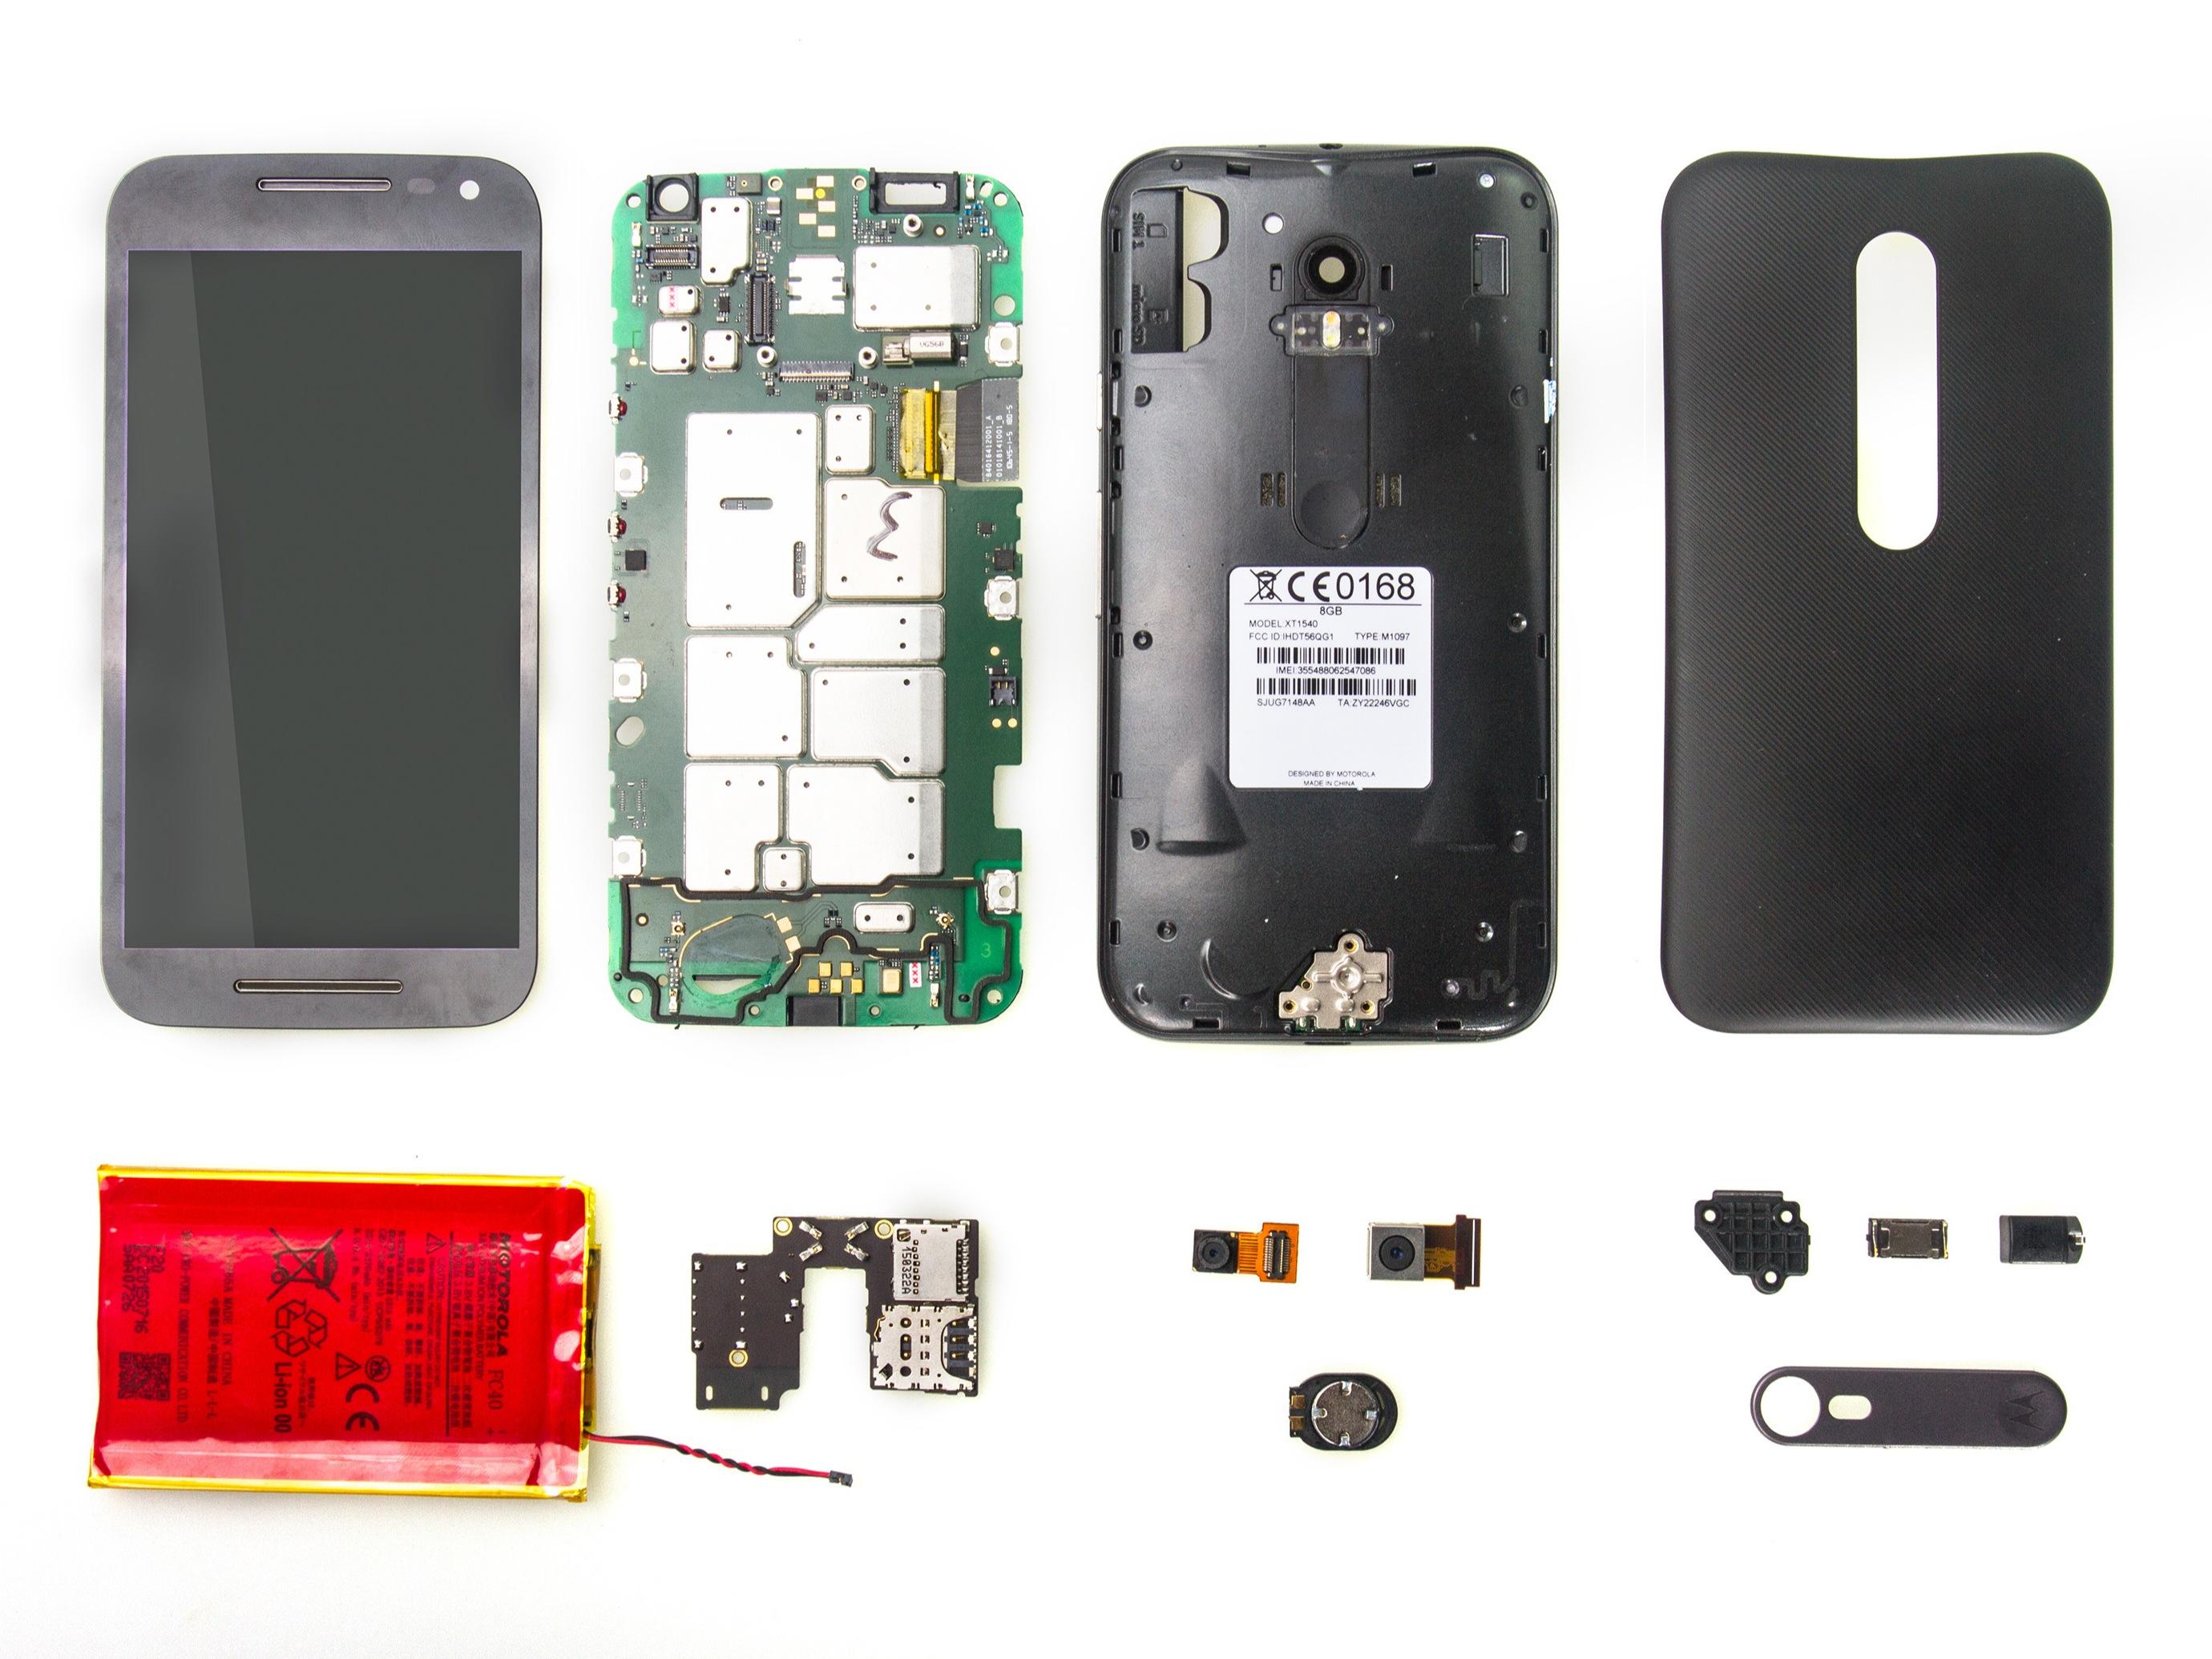 Motorola Moto G 3rd Generation Repair Ifixit